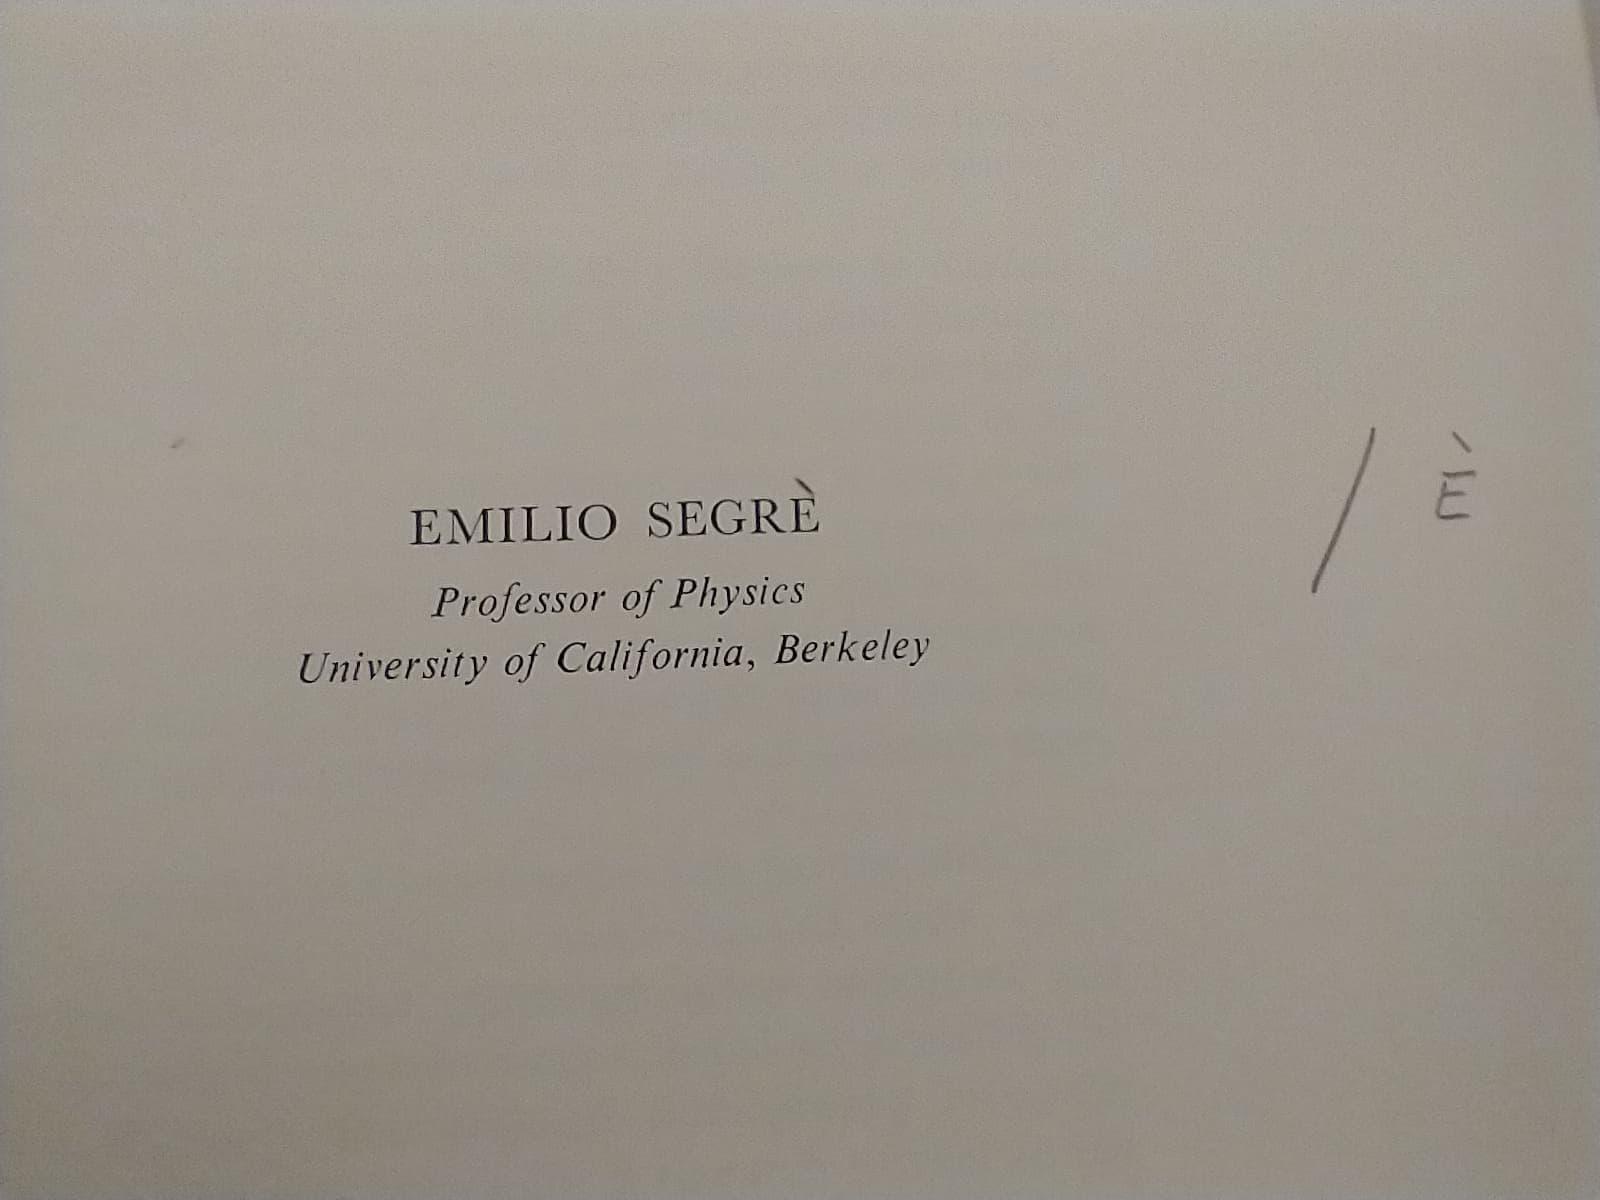 Title page: Emilio Segre (corrected to Segrè), Professor of Physics, University of California, Berkeley